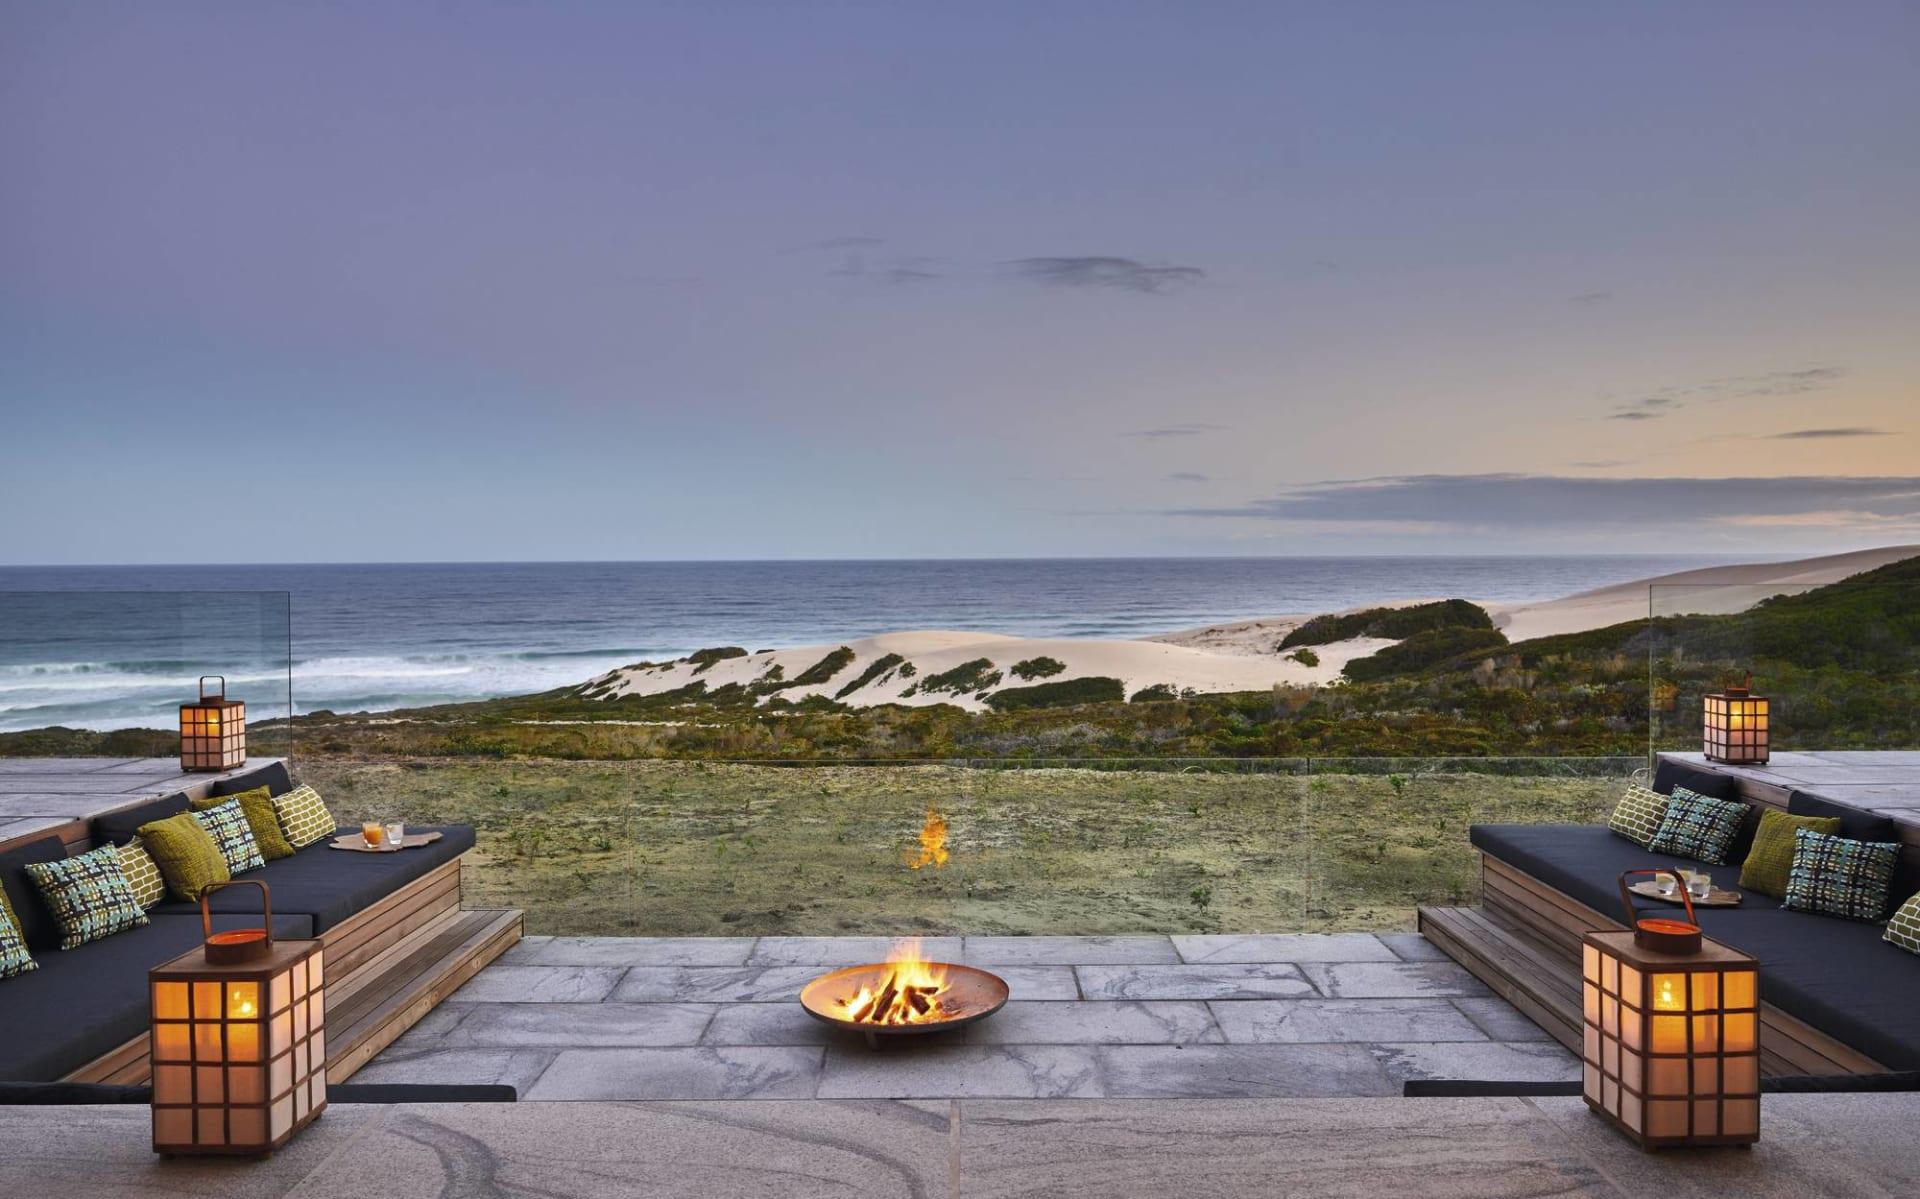 Wonders of South Africa ab Kapstadt: exterior Morukuru Beach Lodge - Lounge mit Feuerstelle